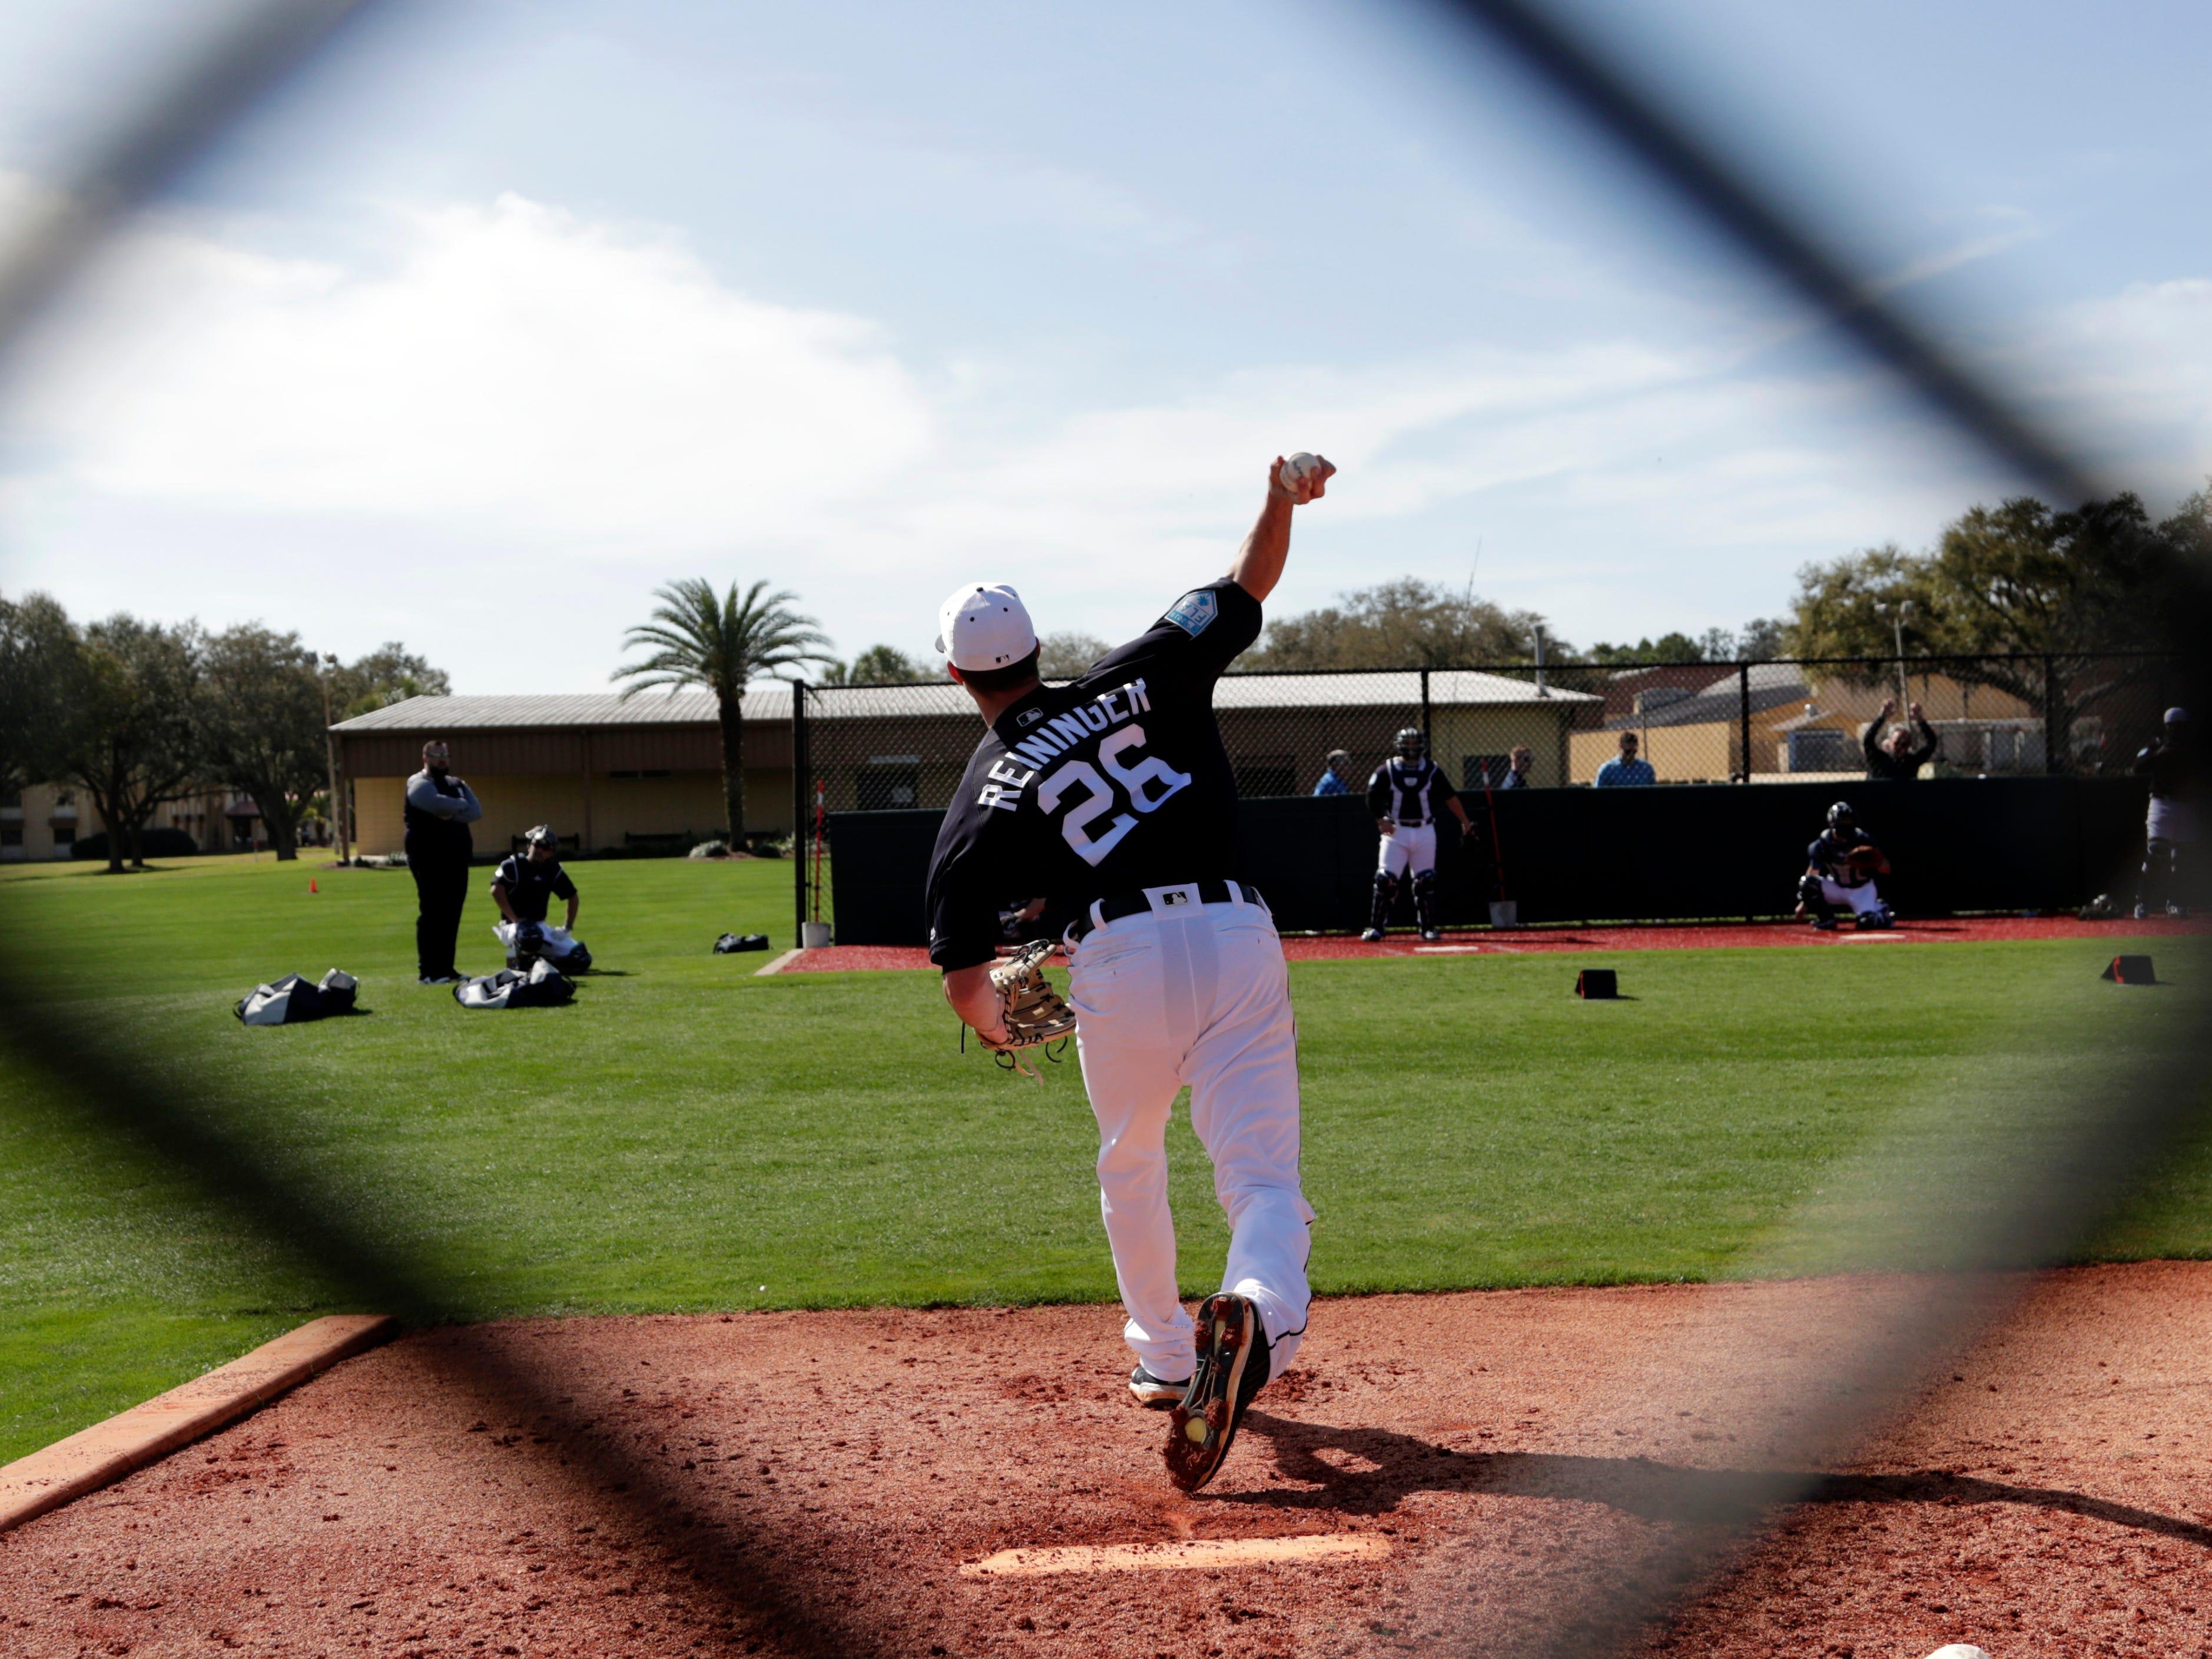 Detroit Tigers relief pitcher Zac Reininger (26) throws in the bullpen.